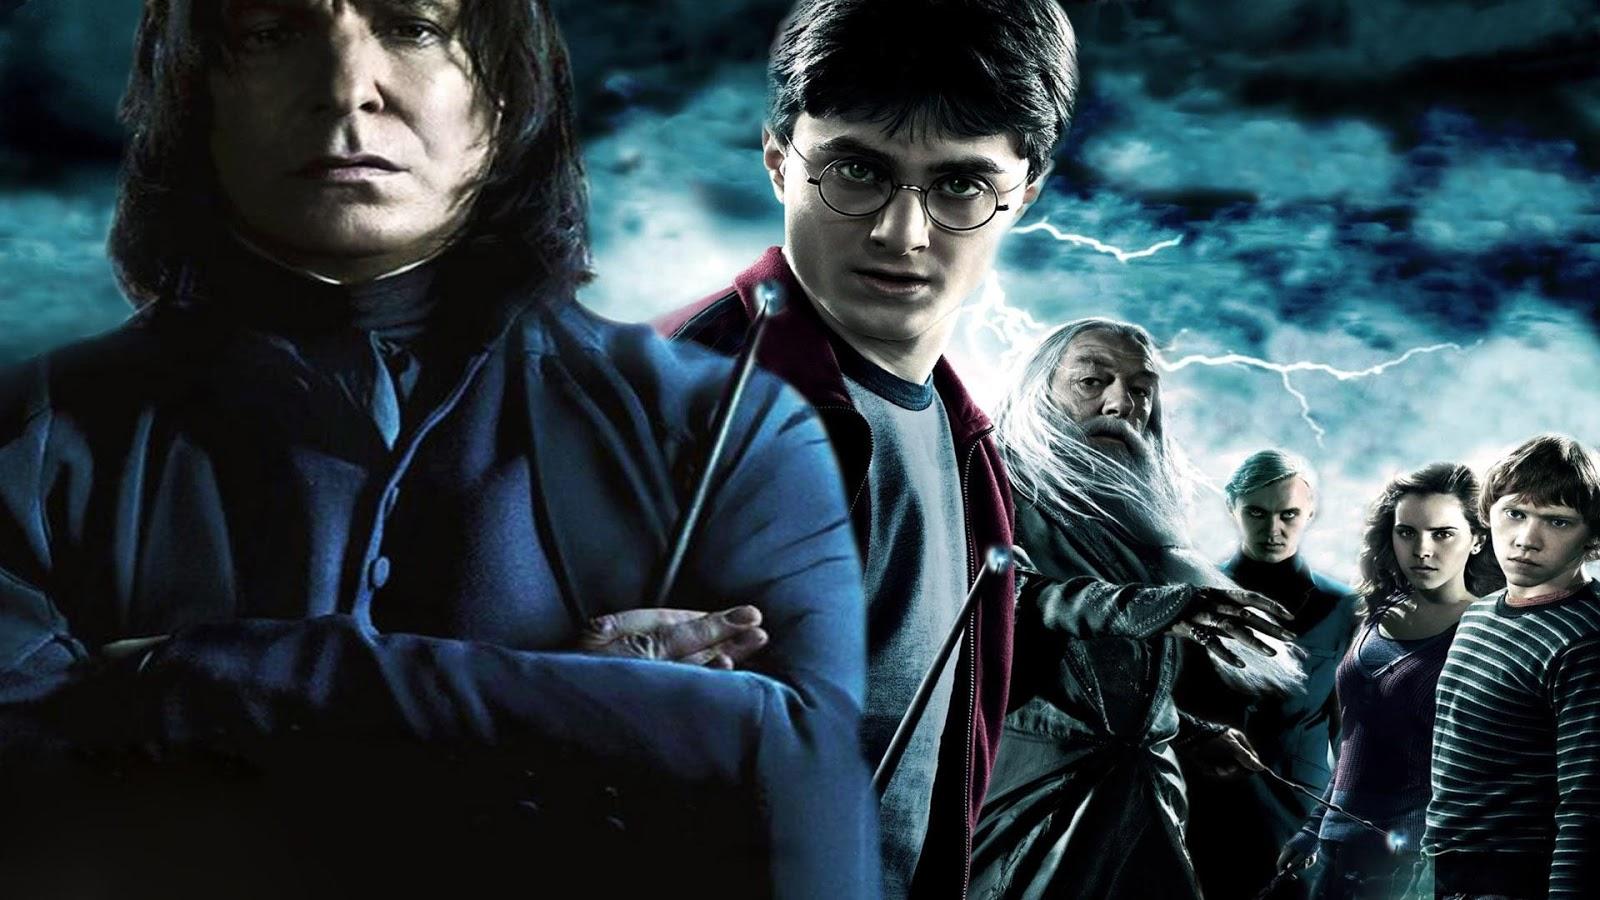 Harry Potter Movie 1080p Wallpaper HD